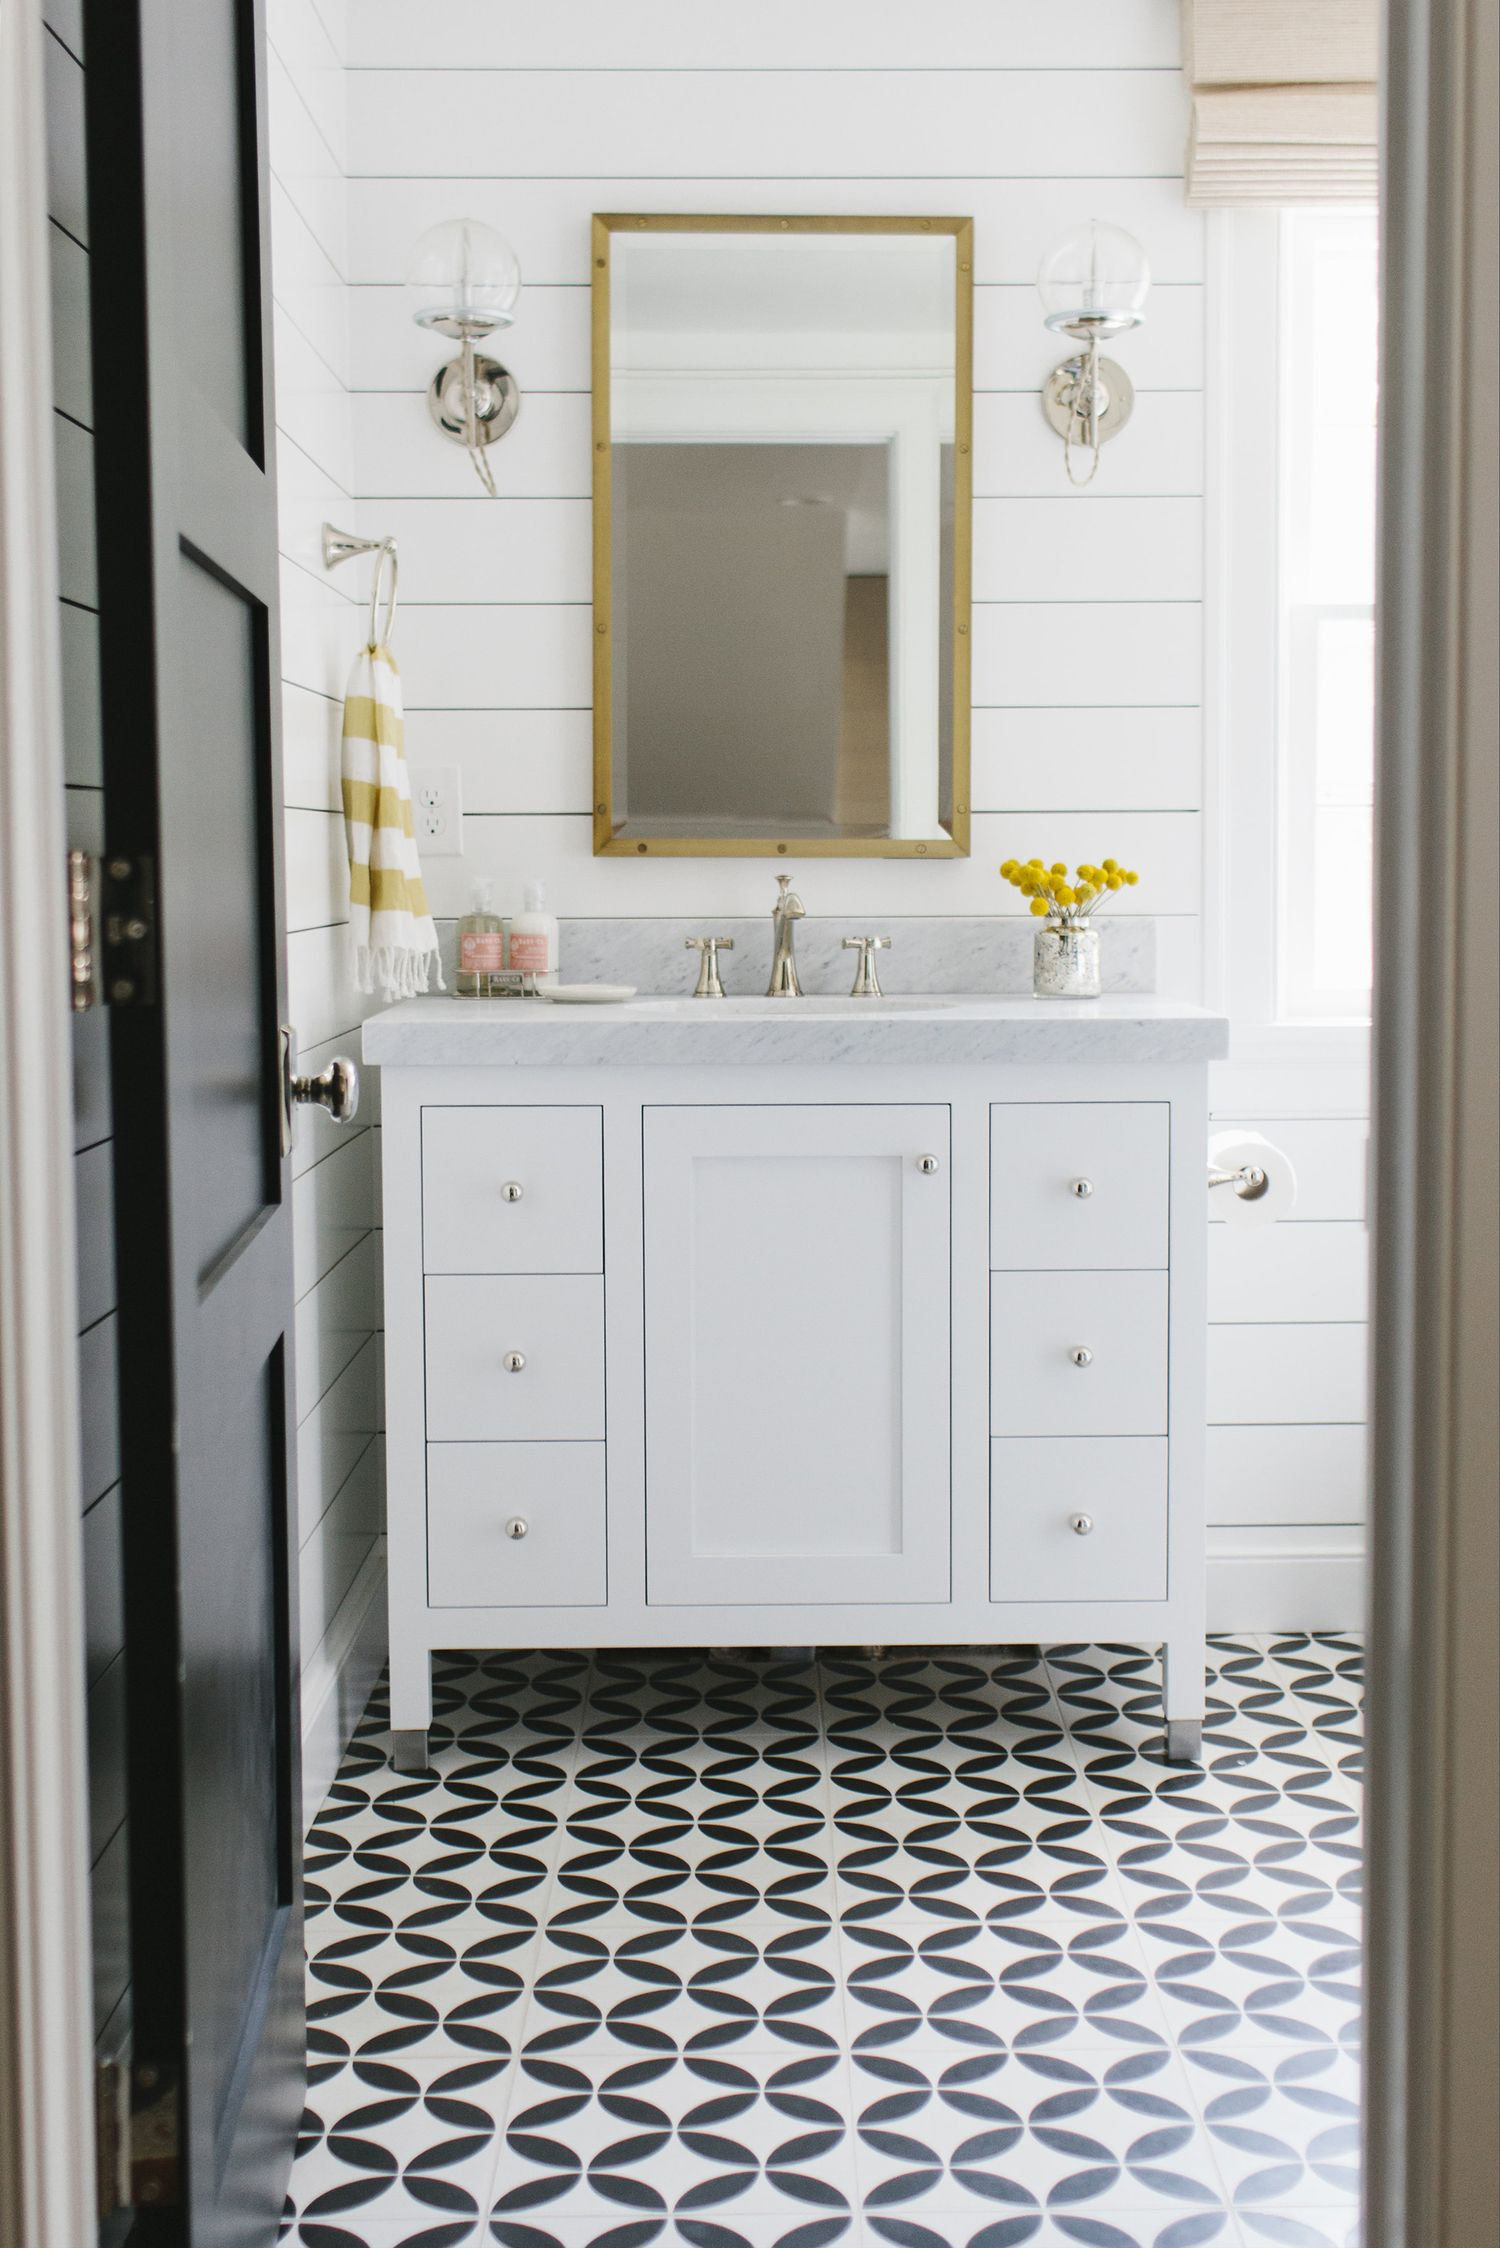 Lynwood Remodel: Guest Bathroom | Studio mcgee, Cement and Studio